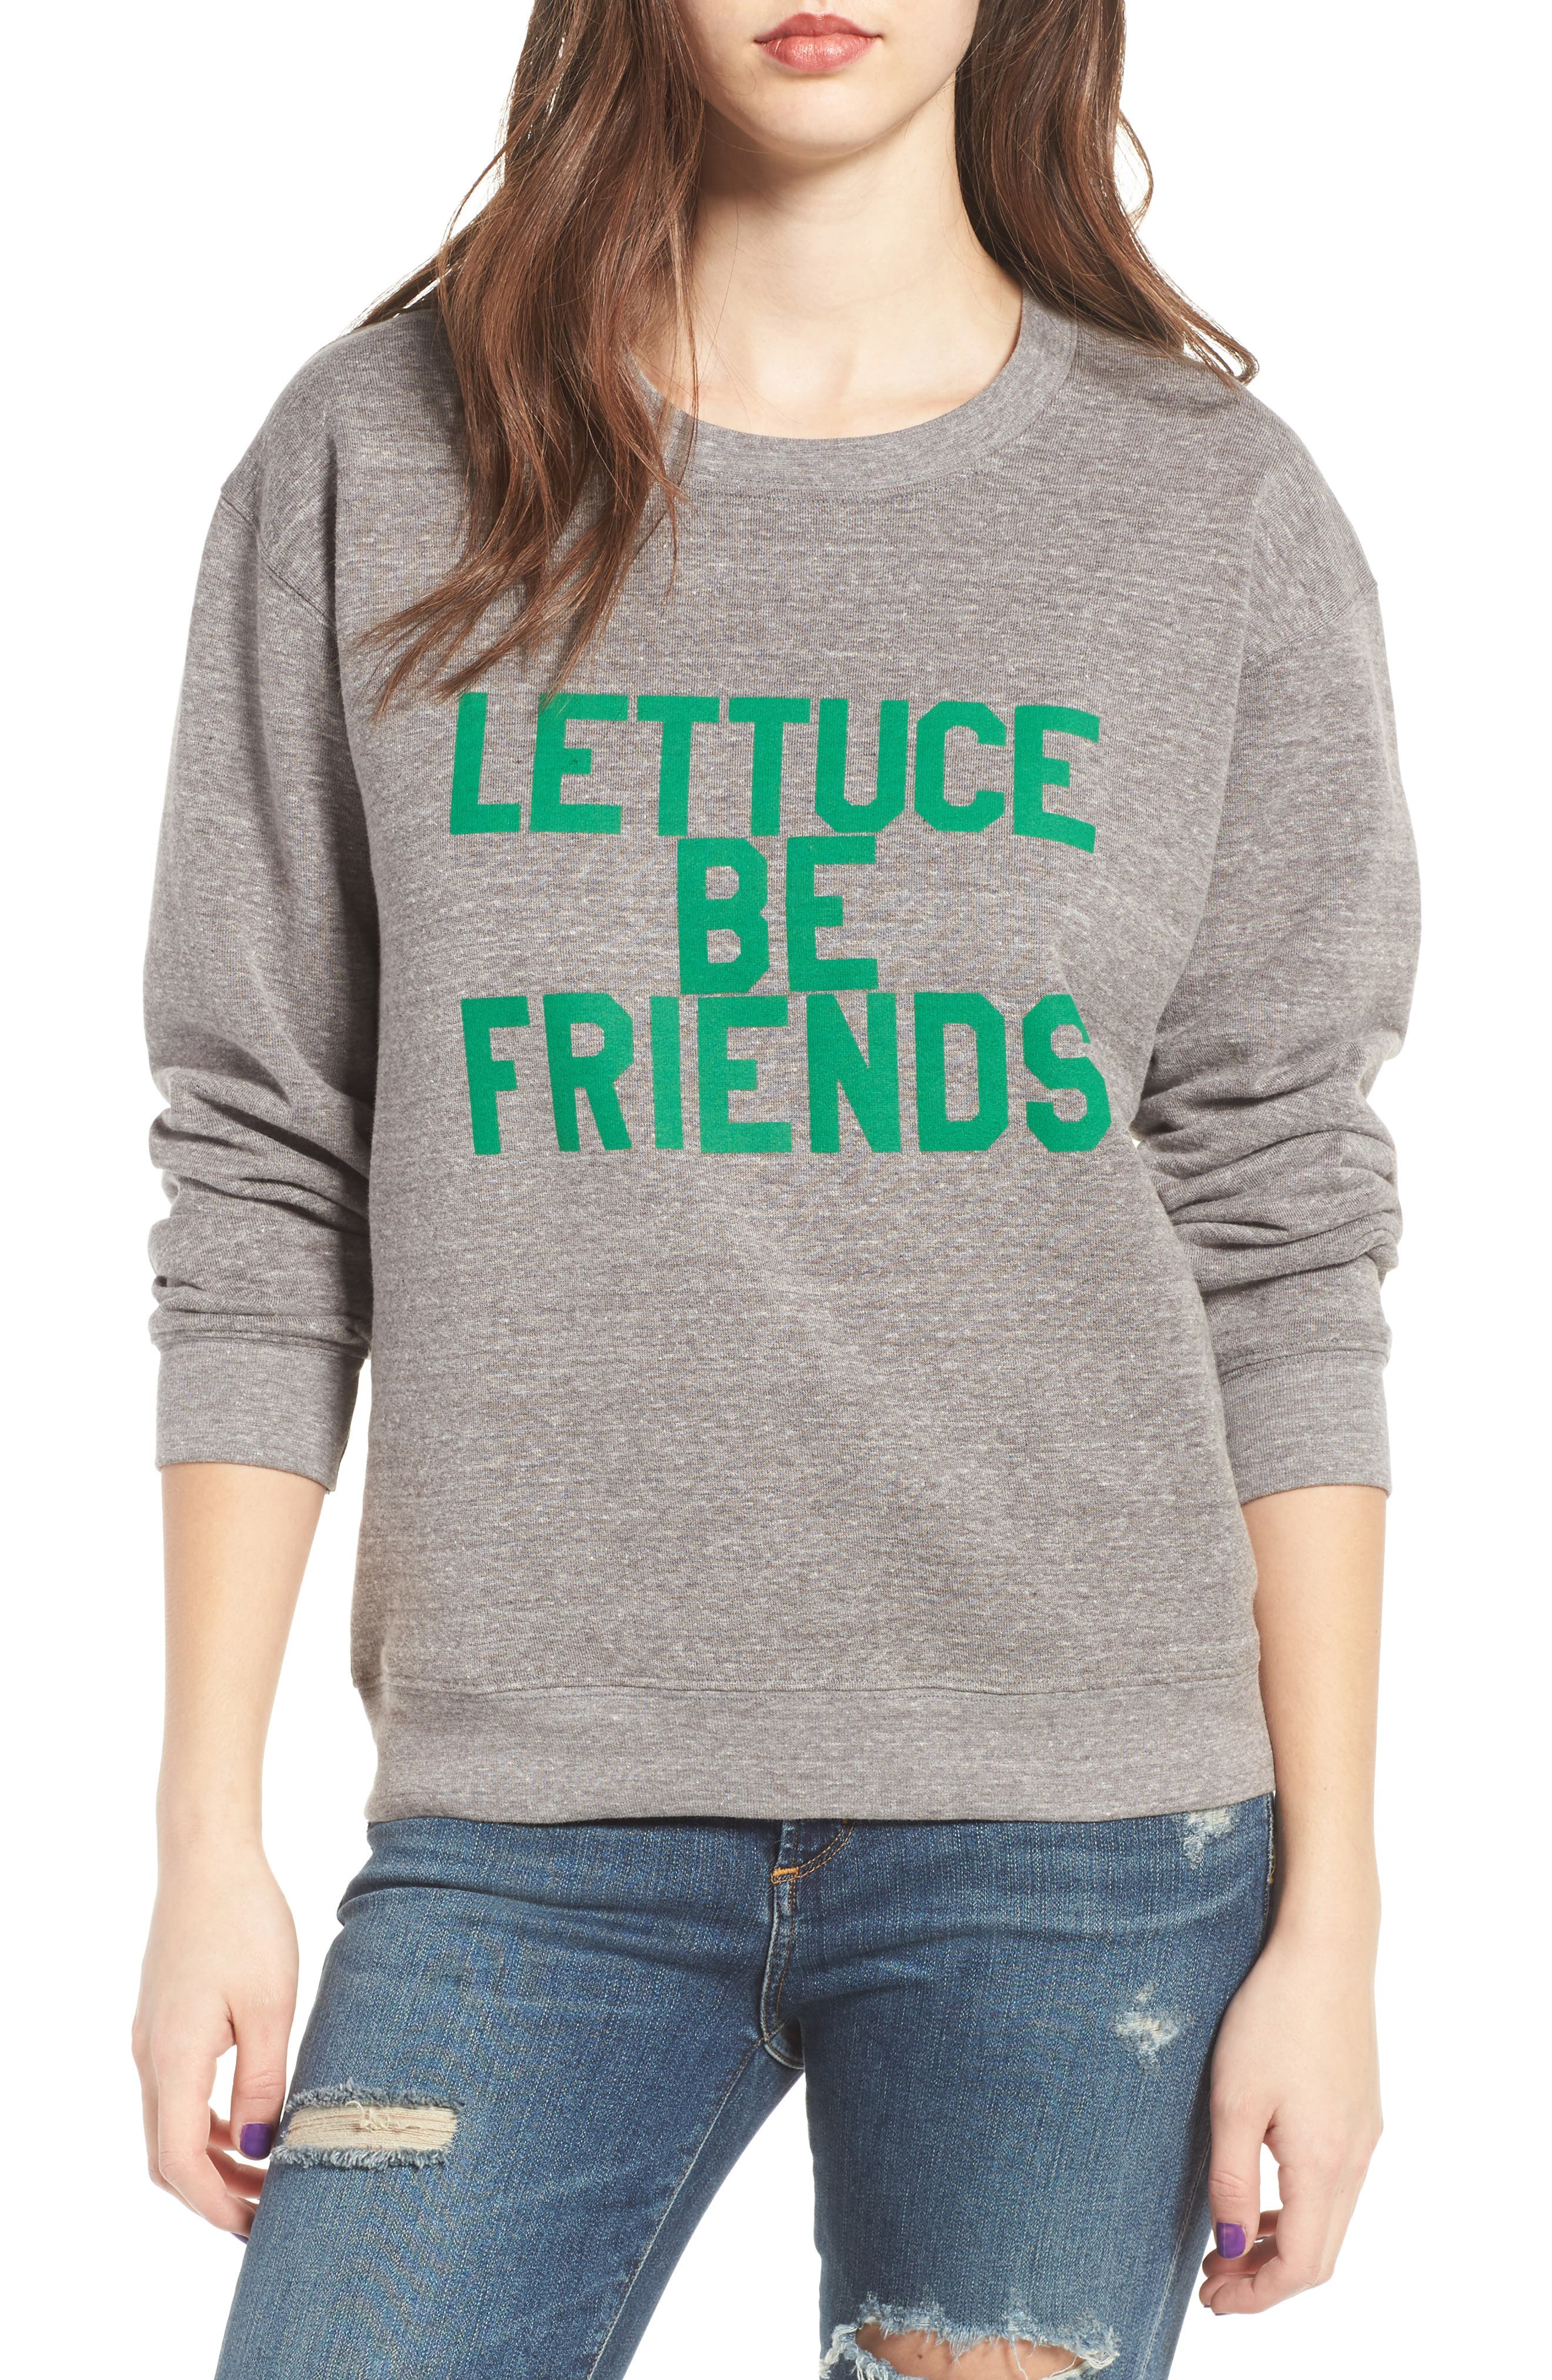 Lettuce Be Friends Sweatshirt,                             Main thumbnail 1, color,                             050